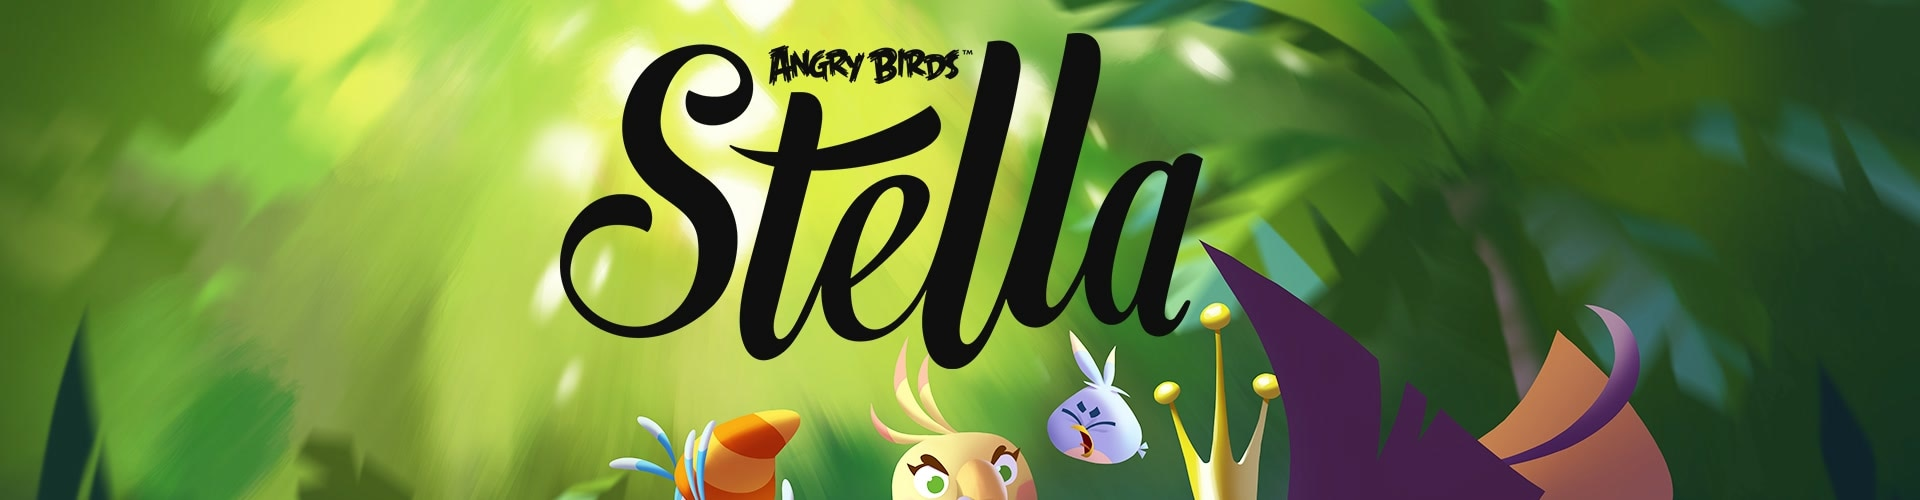 Watch Angry Birds Stella Online